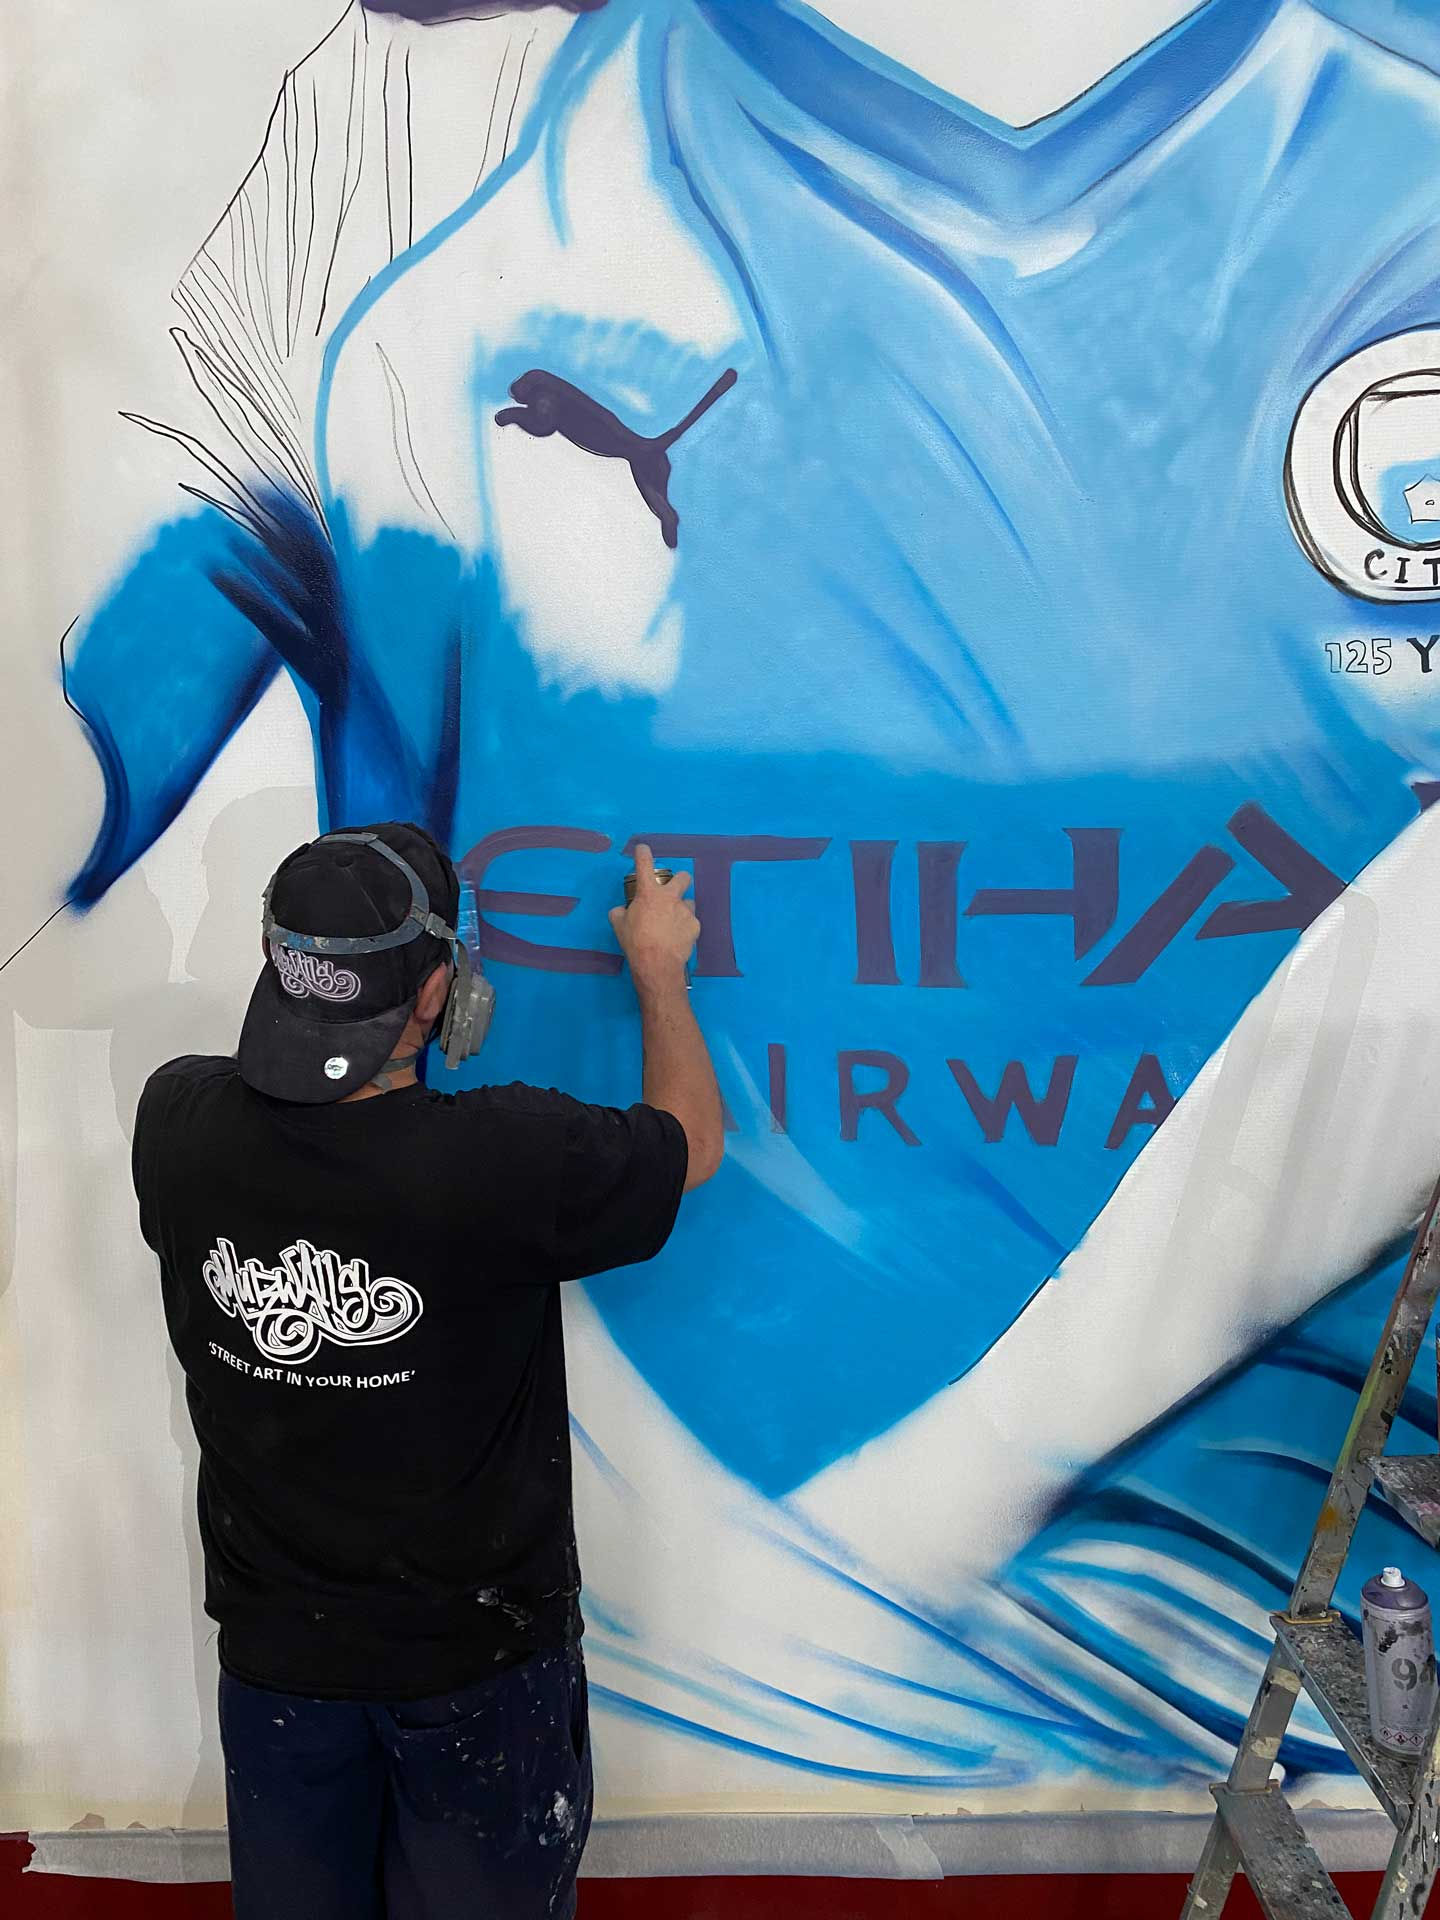 074-serena williams-tennis-womens tennis-world champion-street art mural-street art.